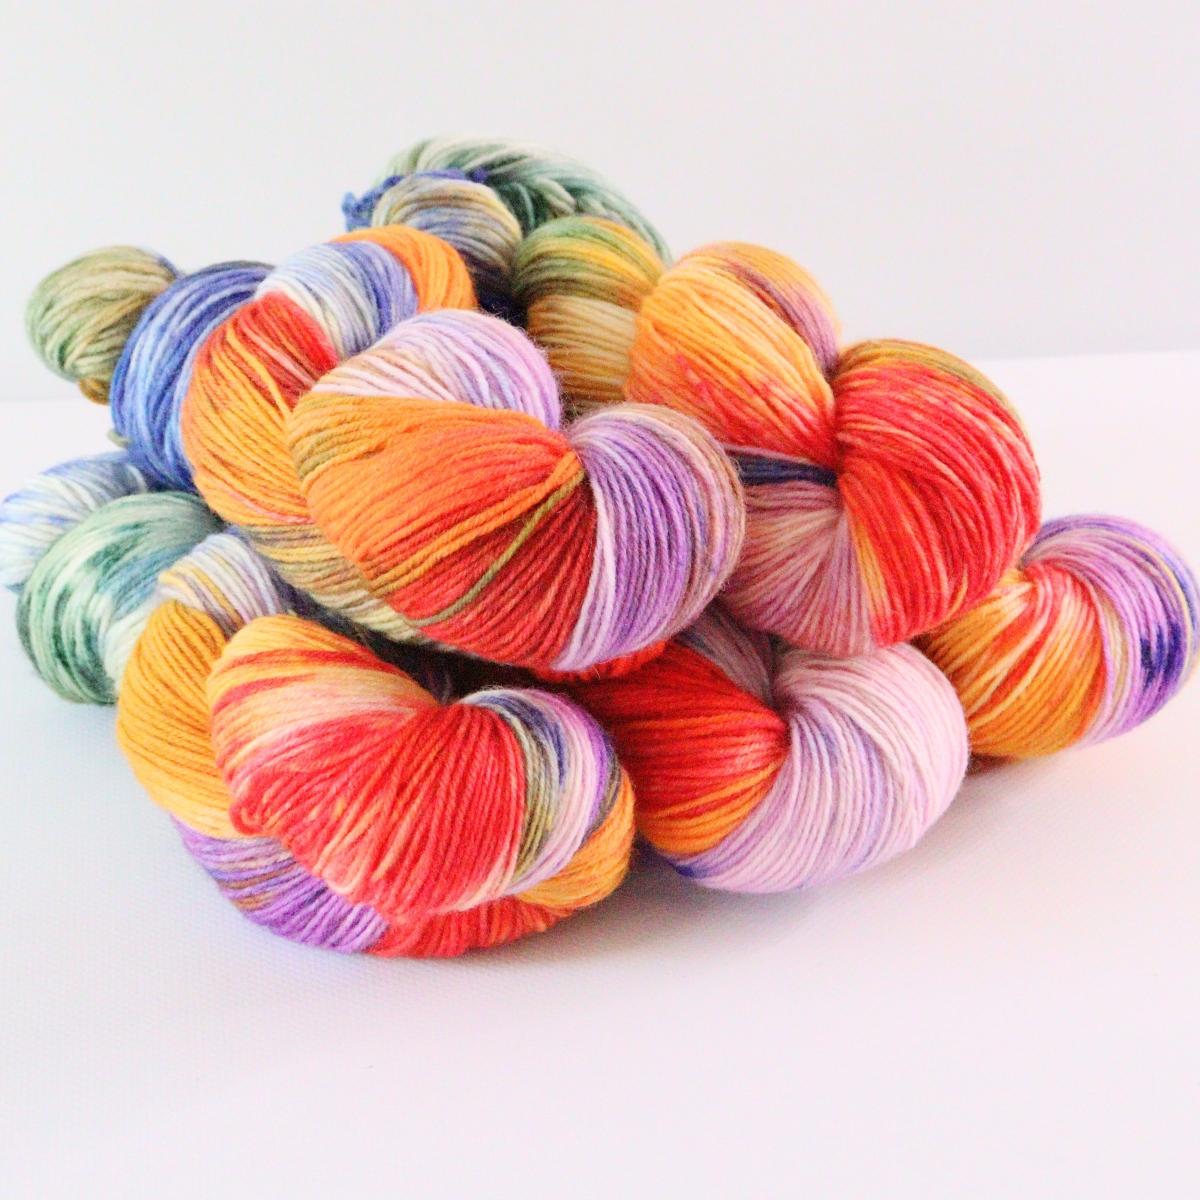 woodico.pro hand dyed yarn 078 1 1200x1200 - Hand dyed yarn / 078